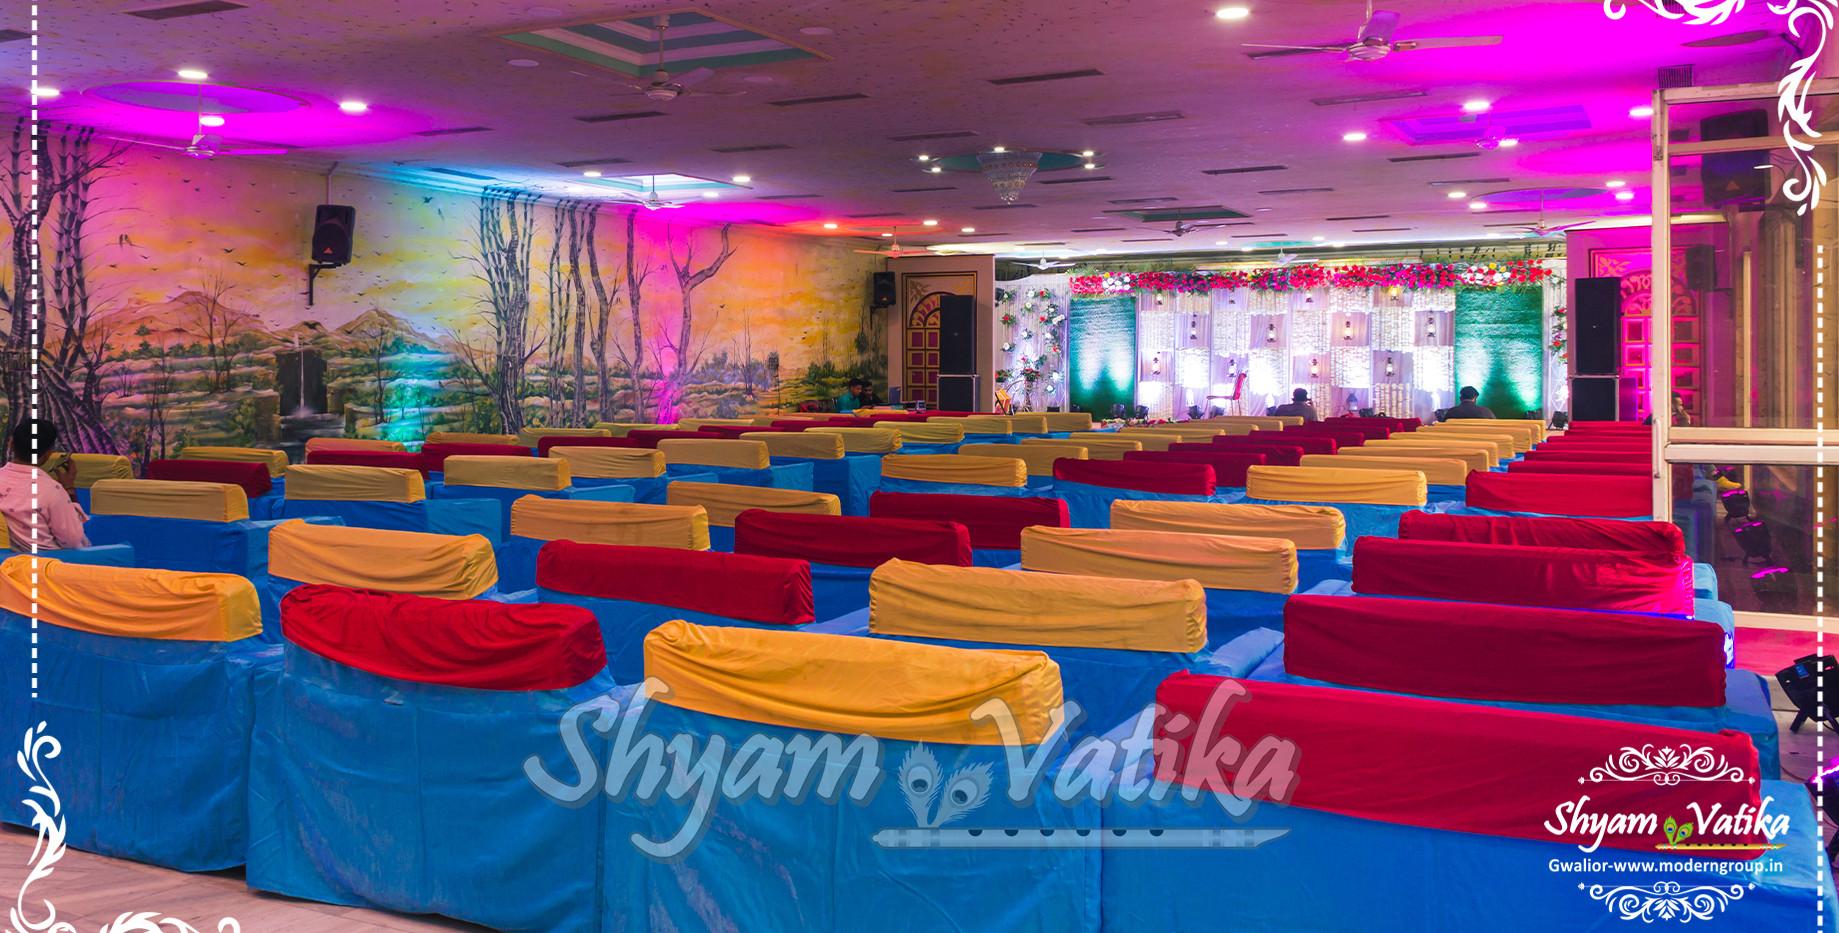 Shyam Vatika Gwalior 03.jpg